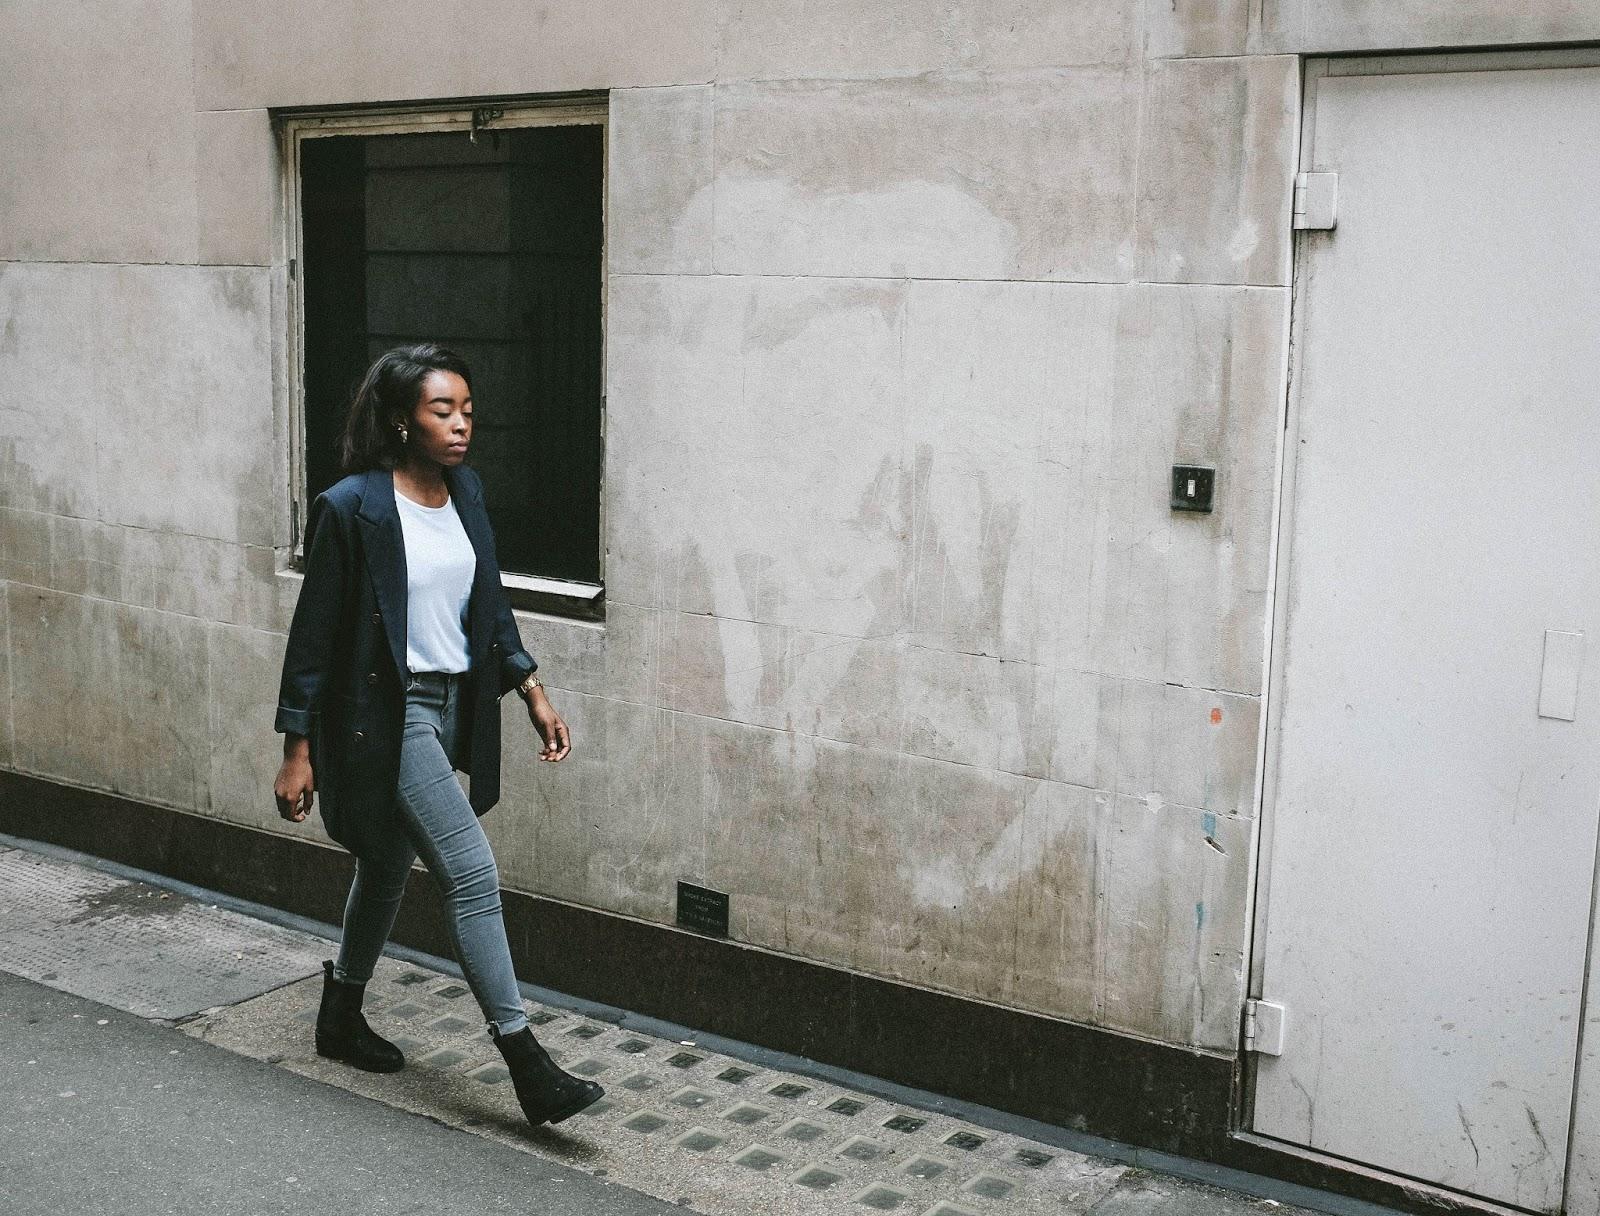 Topshop Archive Collection 2015 Power Shoulder Blazer Black Chelsea Boots Grey Skinny Jeans